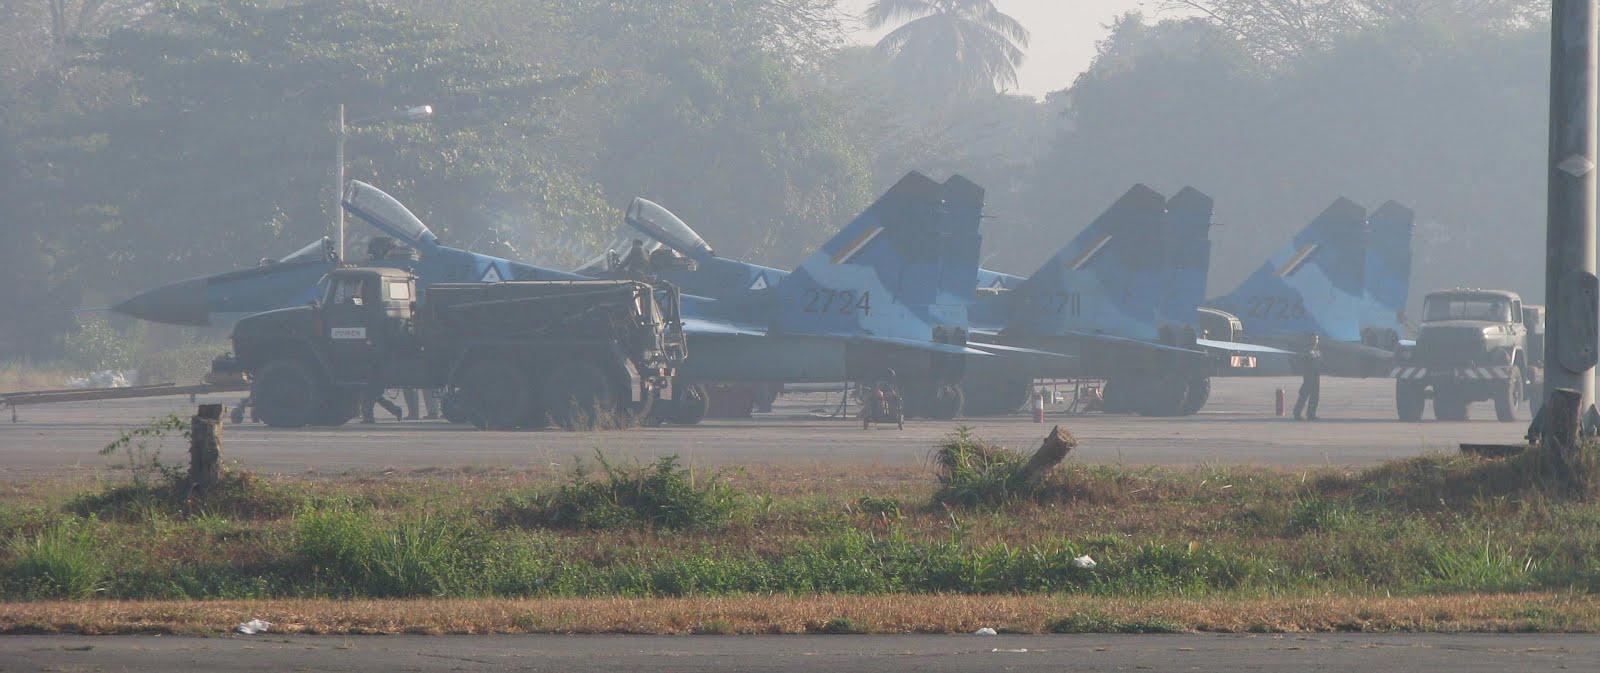 Forces armées birmanes/Myanmar Armed Forces/Tatmadaw BIRMANIA%2BYANGON%2BMINGALADON